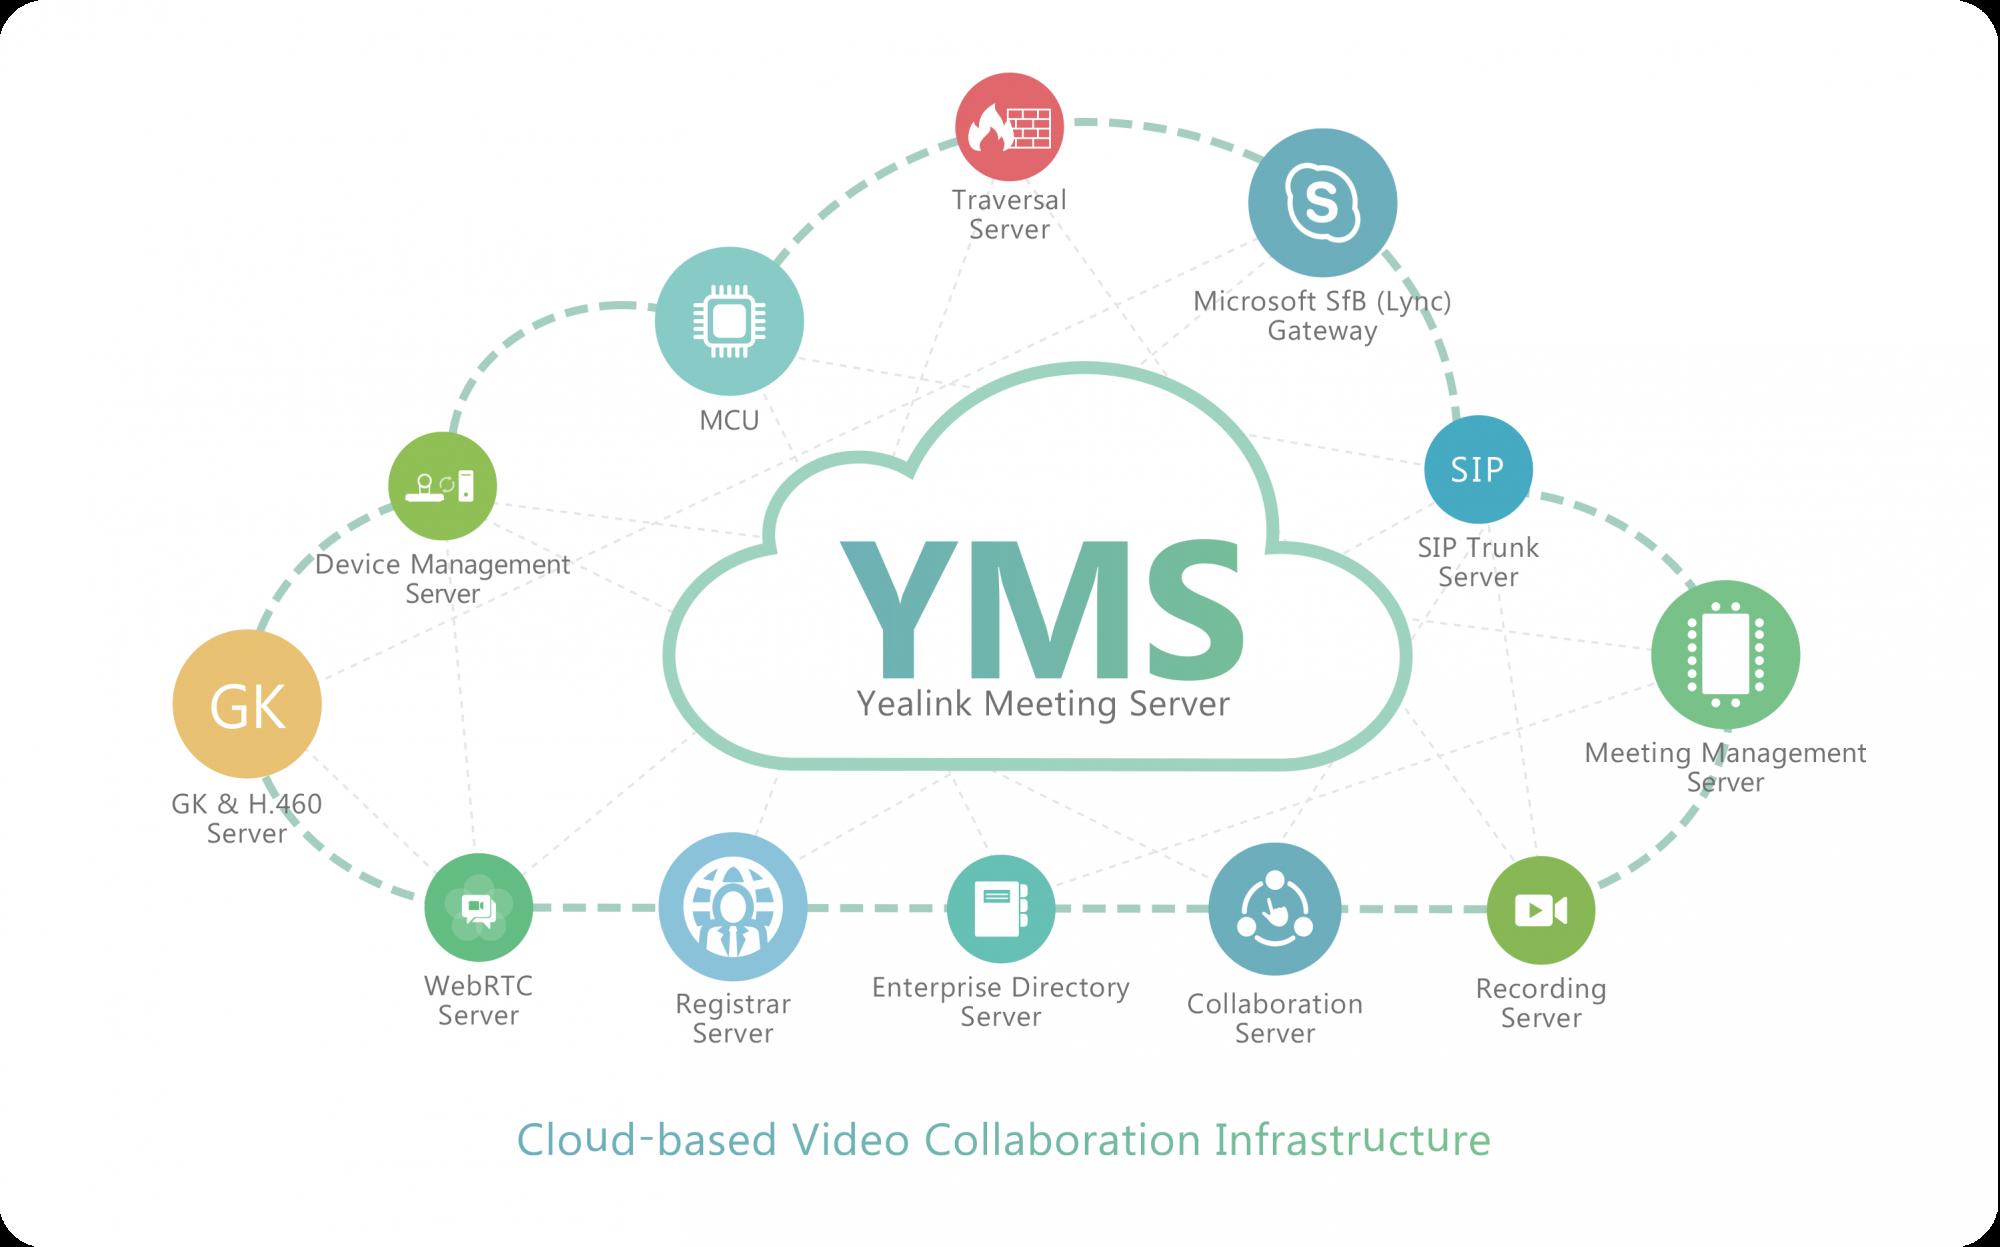 Yealink Meeting - Software de Videoconferencia em Nuvem   - Northshop São Paulo